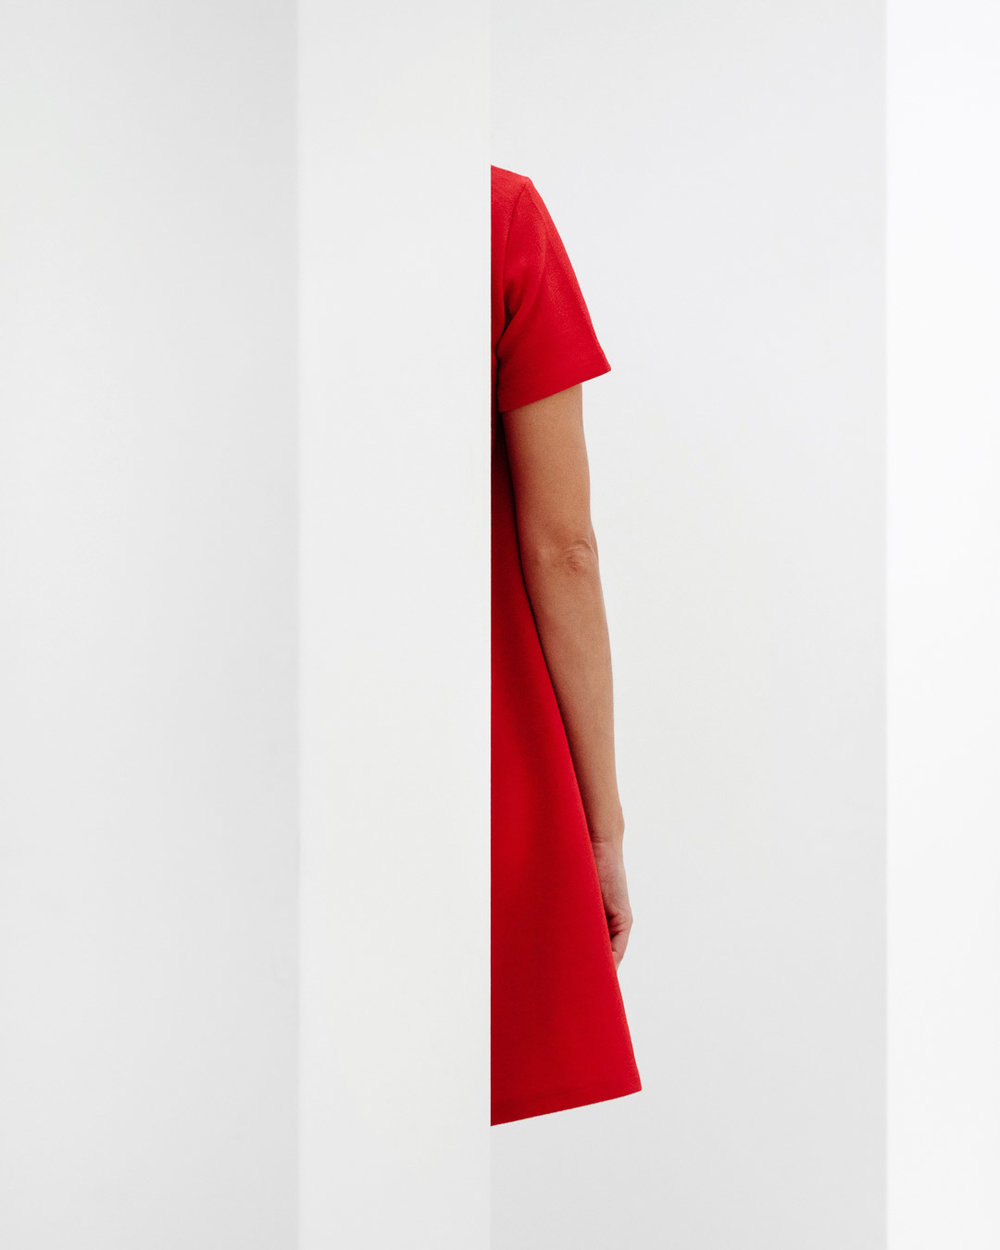 samuel-zeller_red-half-girl-minimalistic_feb-intro_radiant-nyc_web-res.jpg